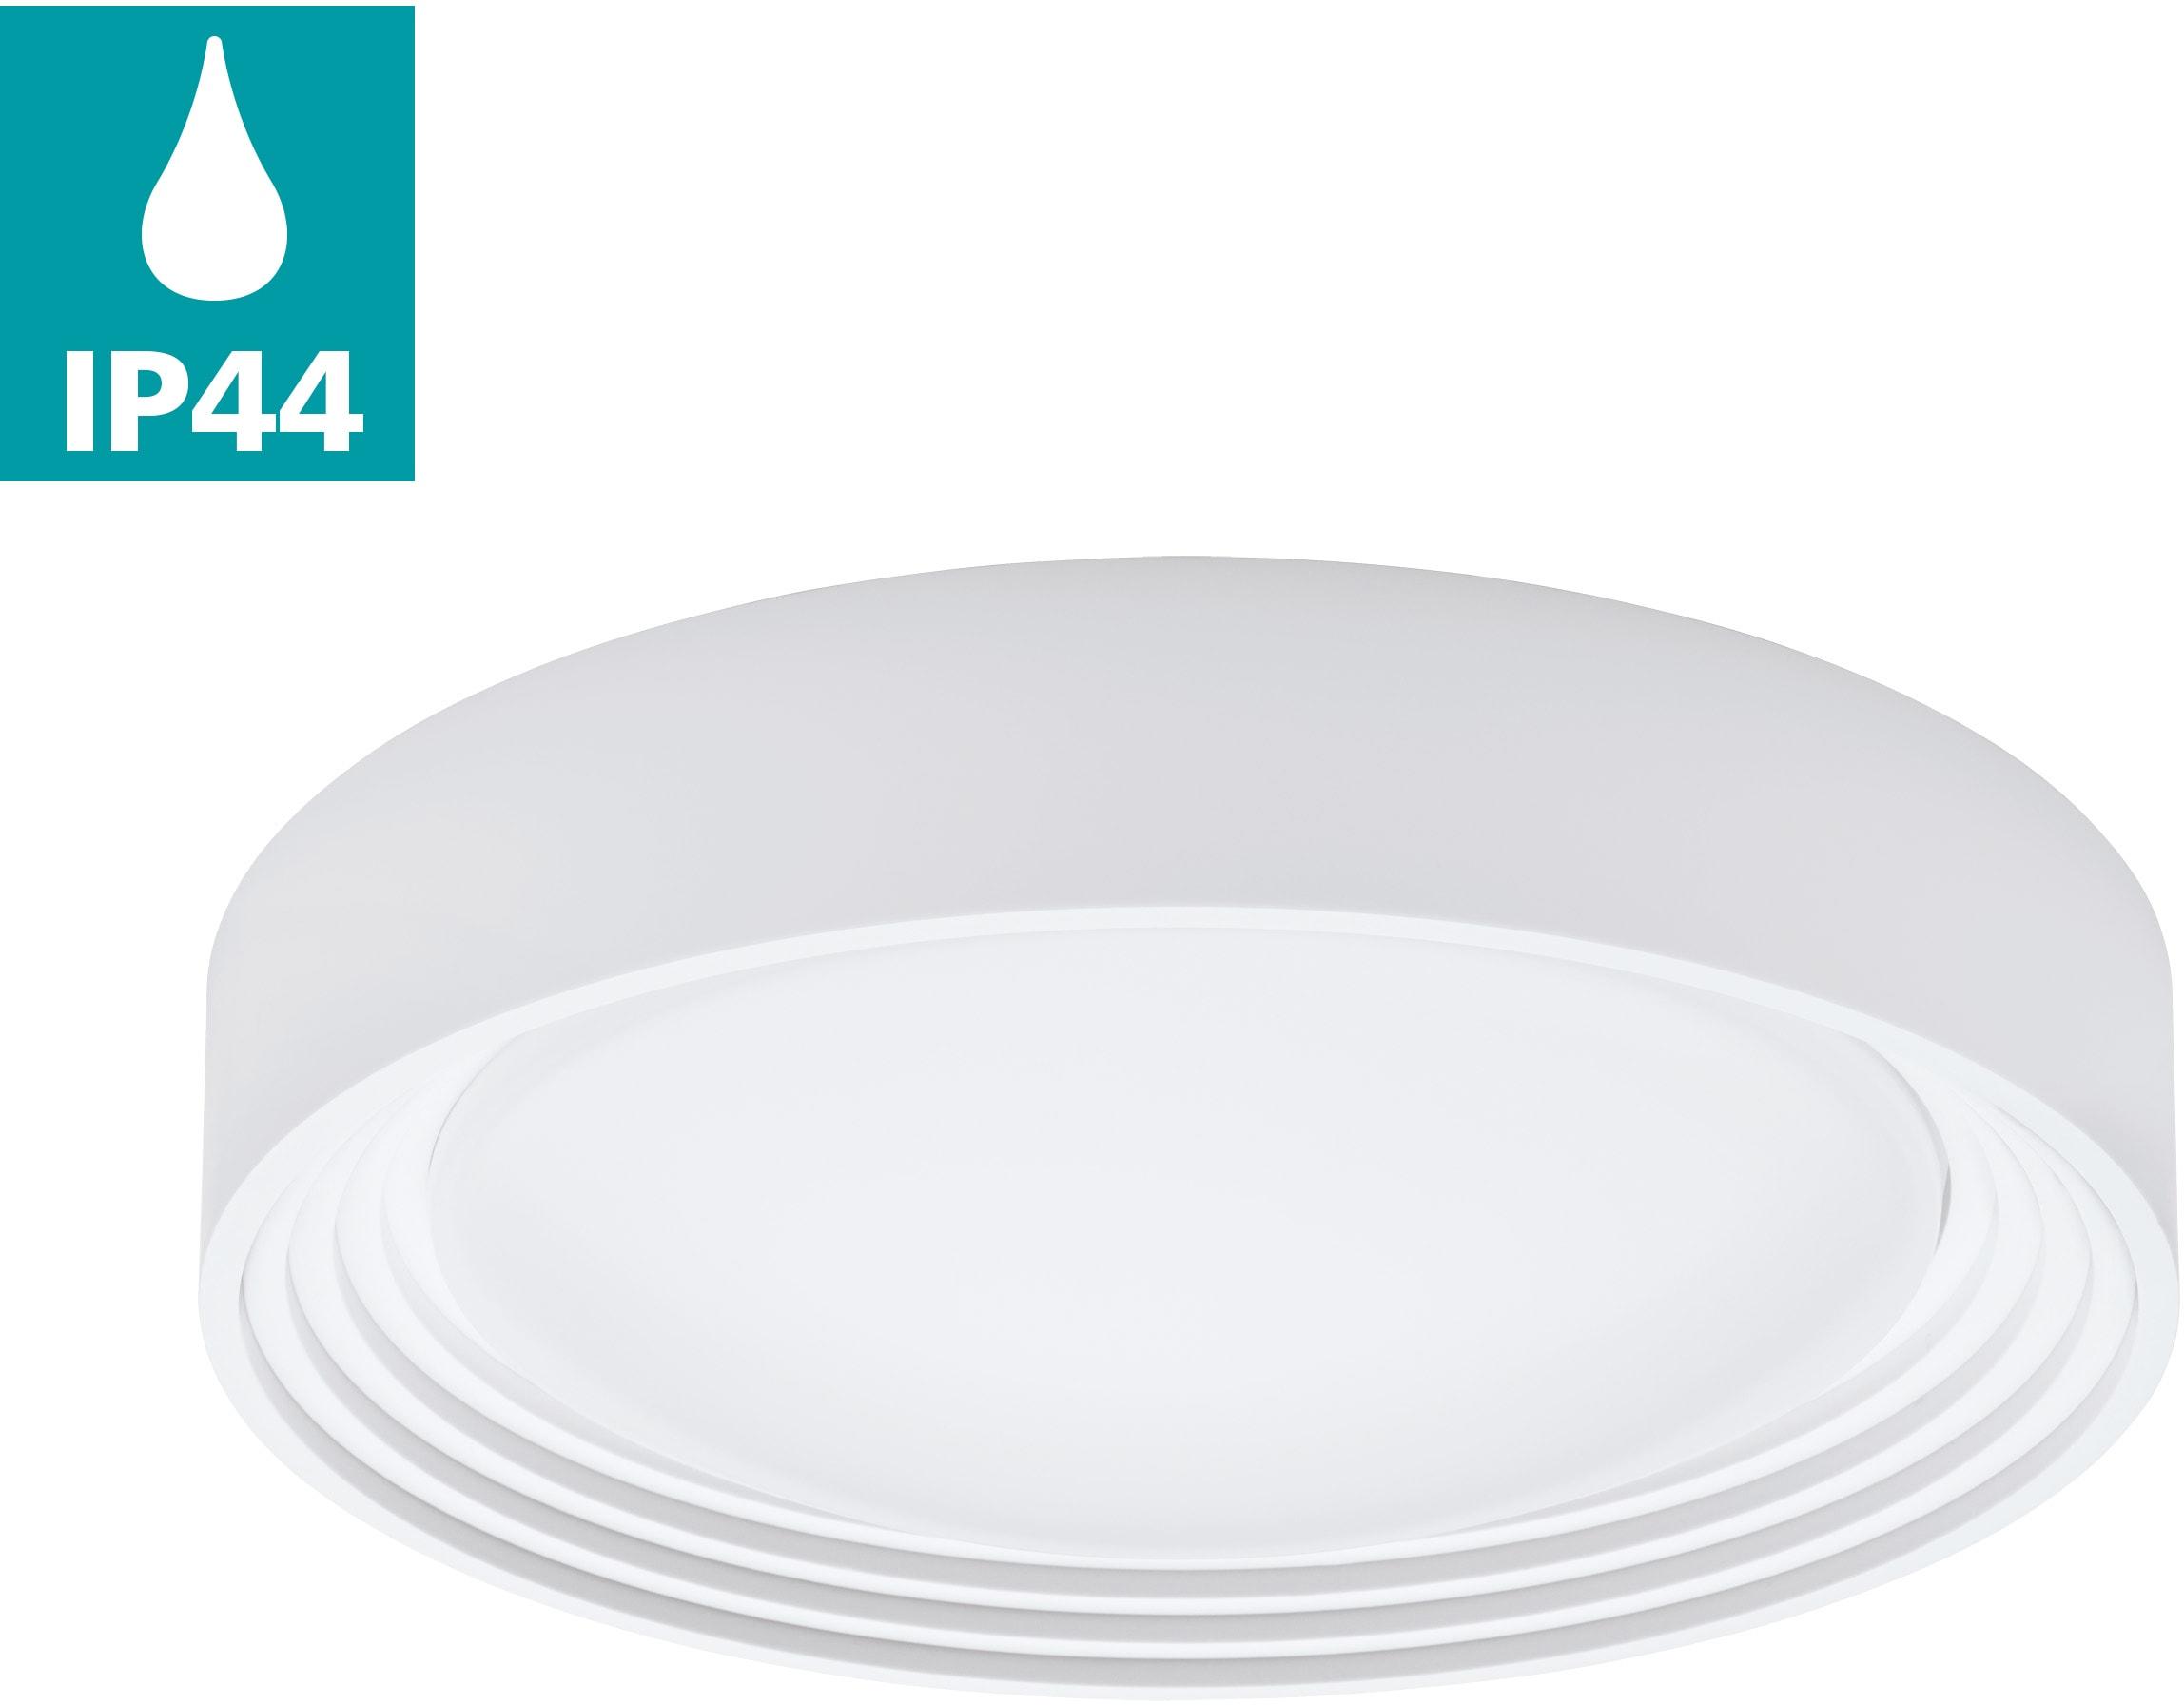 EGLO LED Deckenleuchte ONTANEDA 1, LED-Board, Warmweiß, LED Deckenlampe